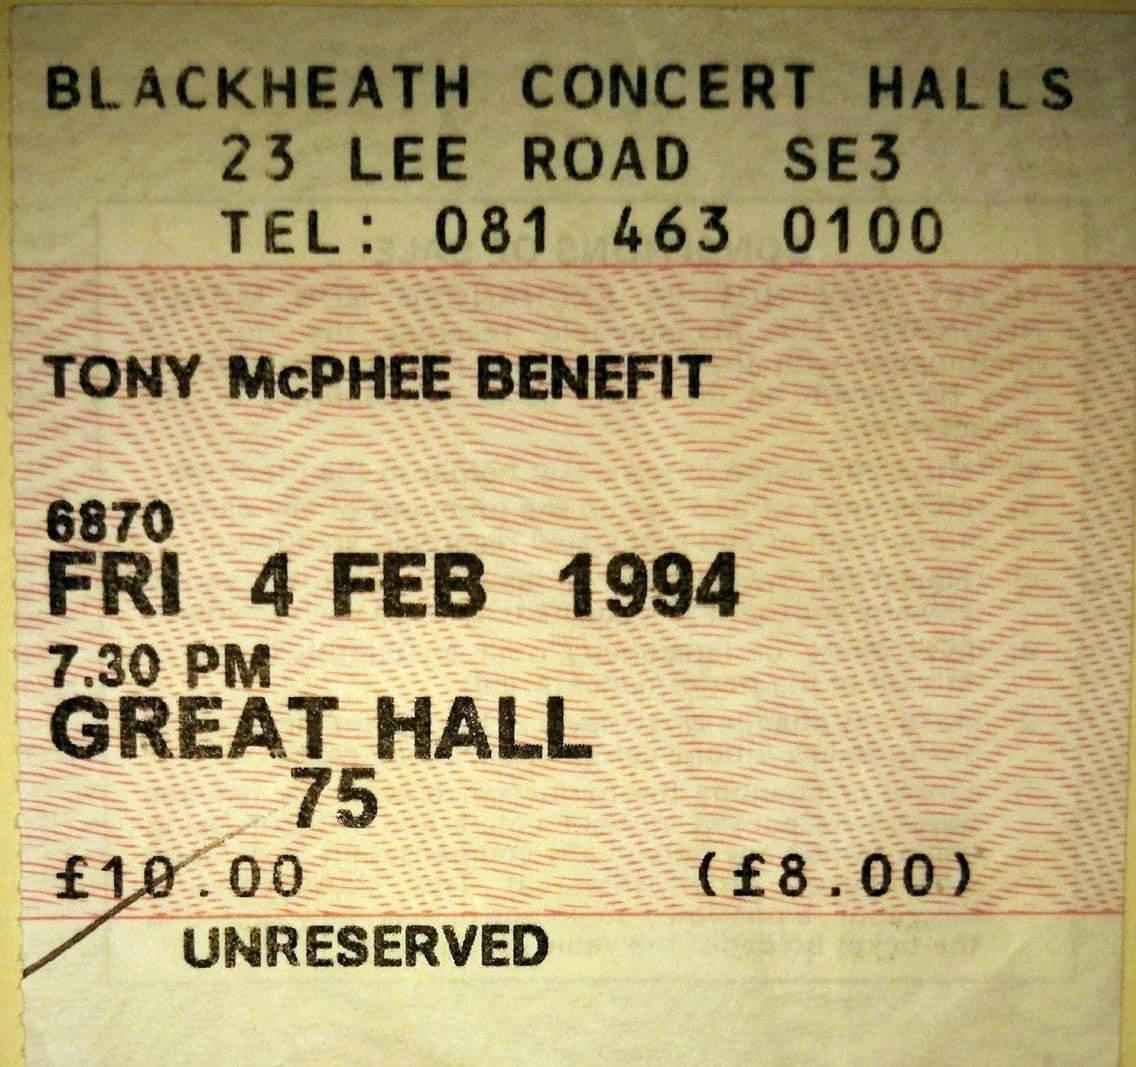 1994-02-04 ticket